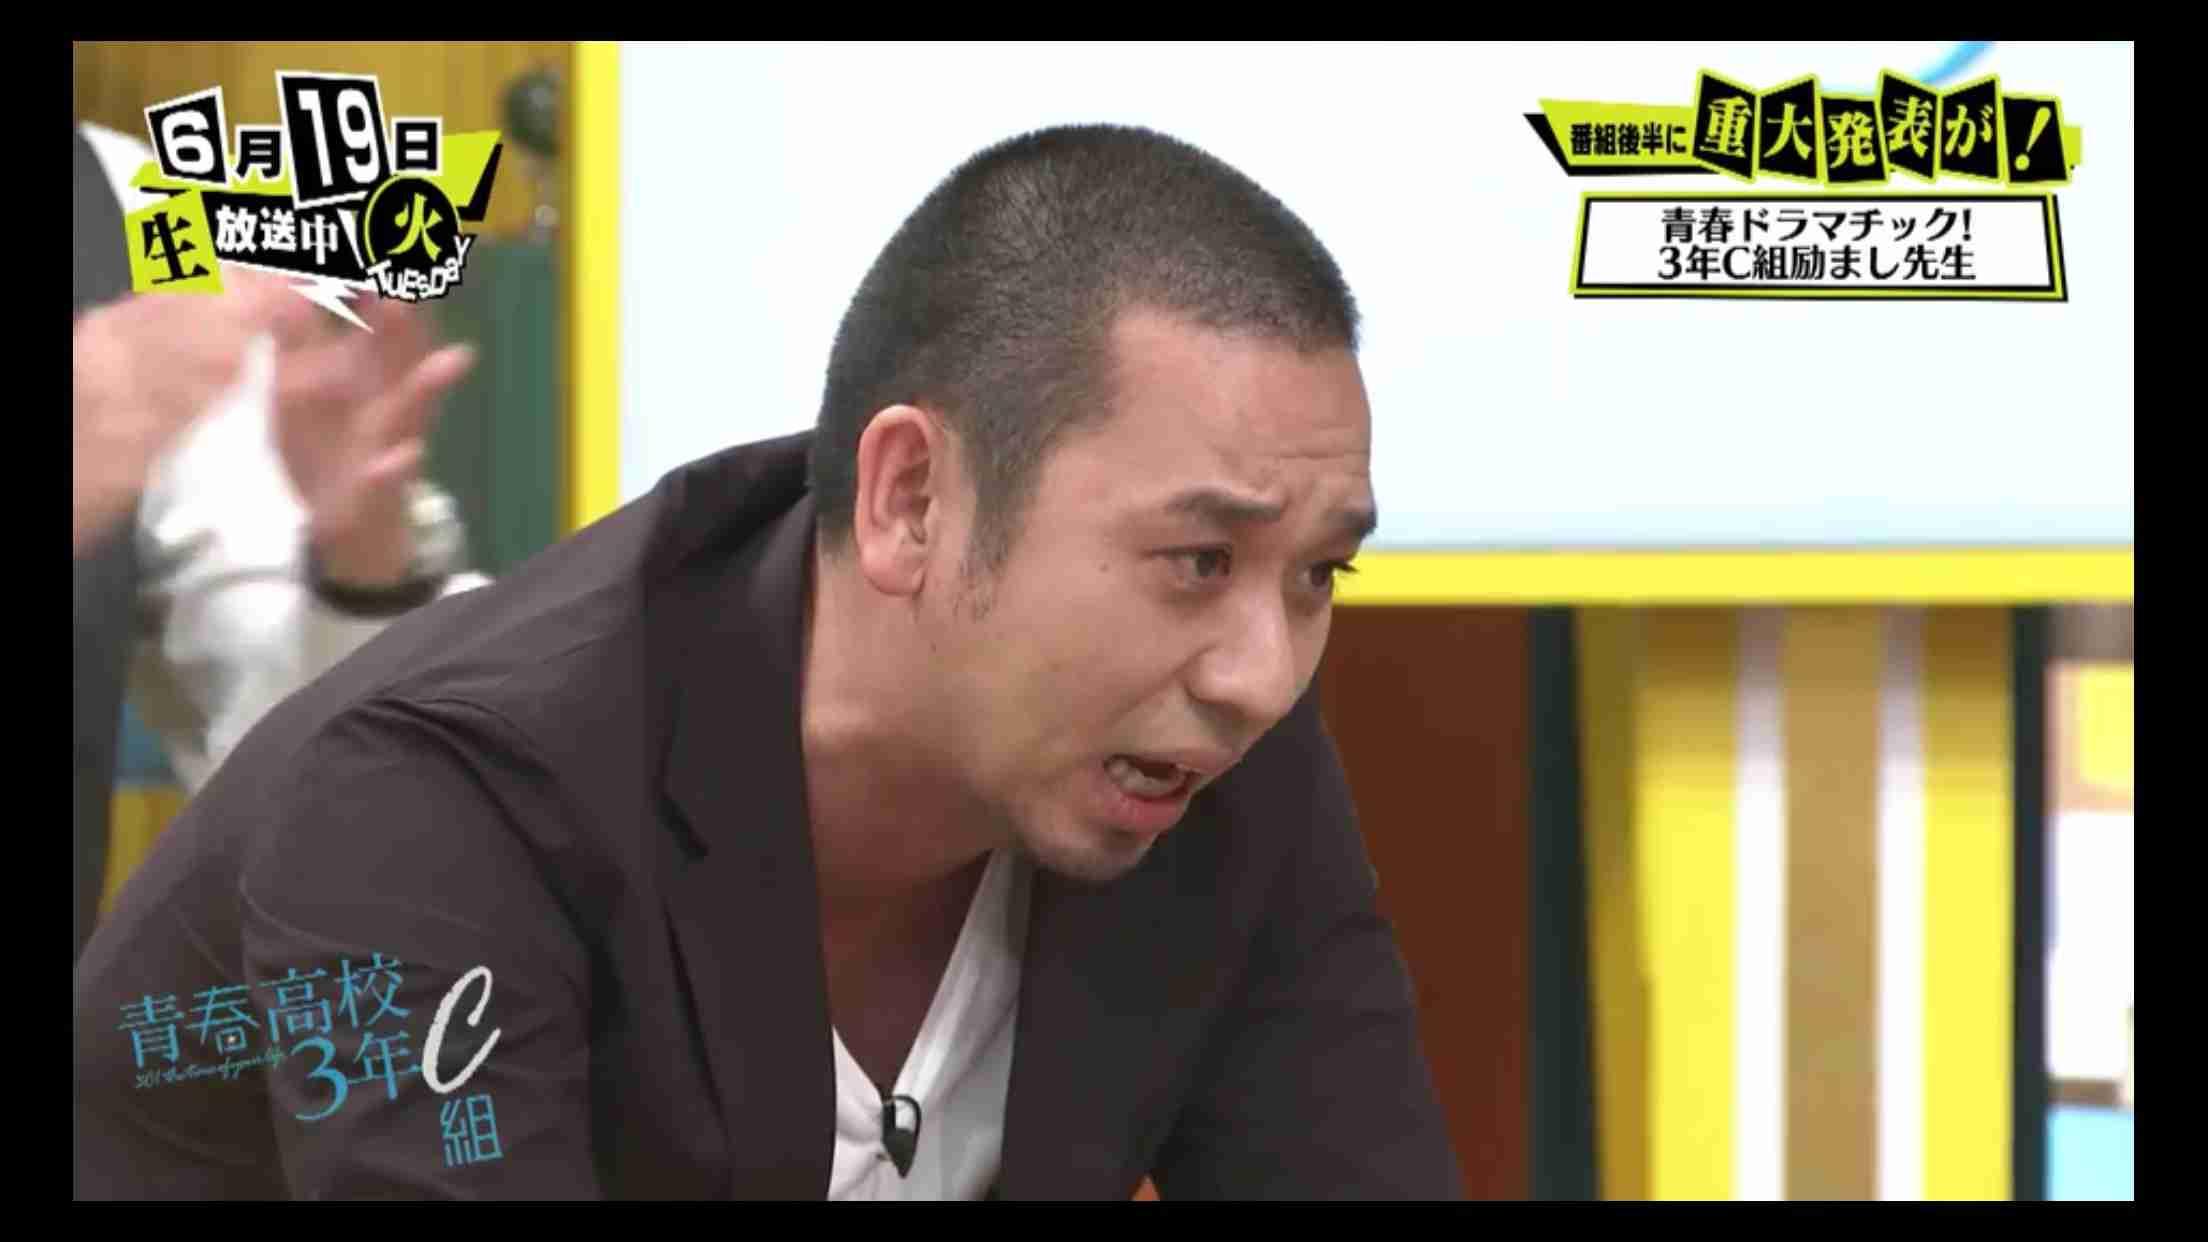 NGT48中井りか、盗撮被害に言及